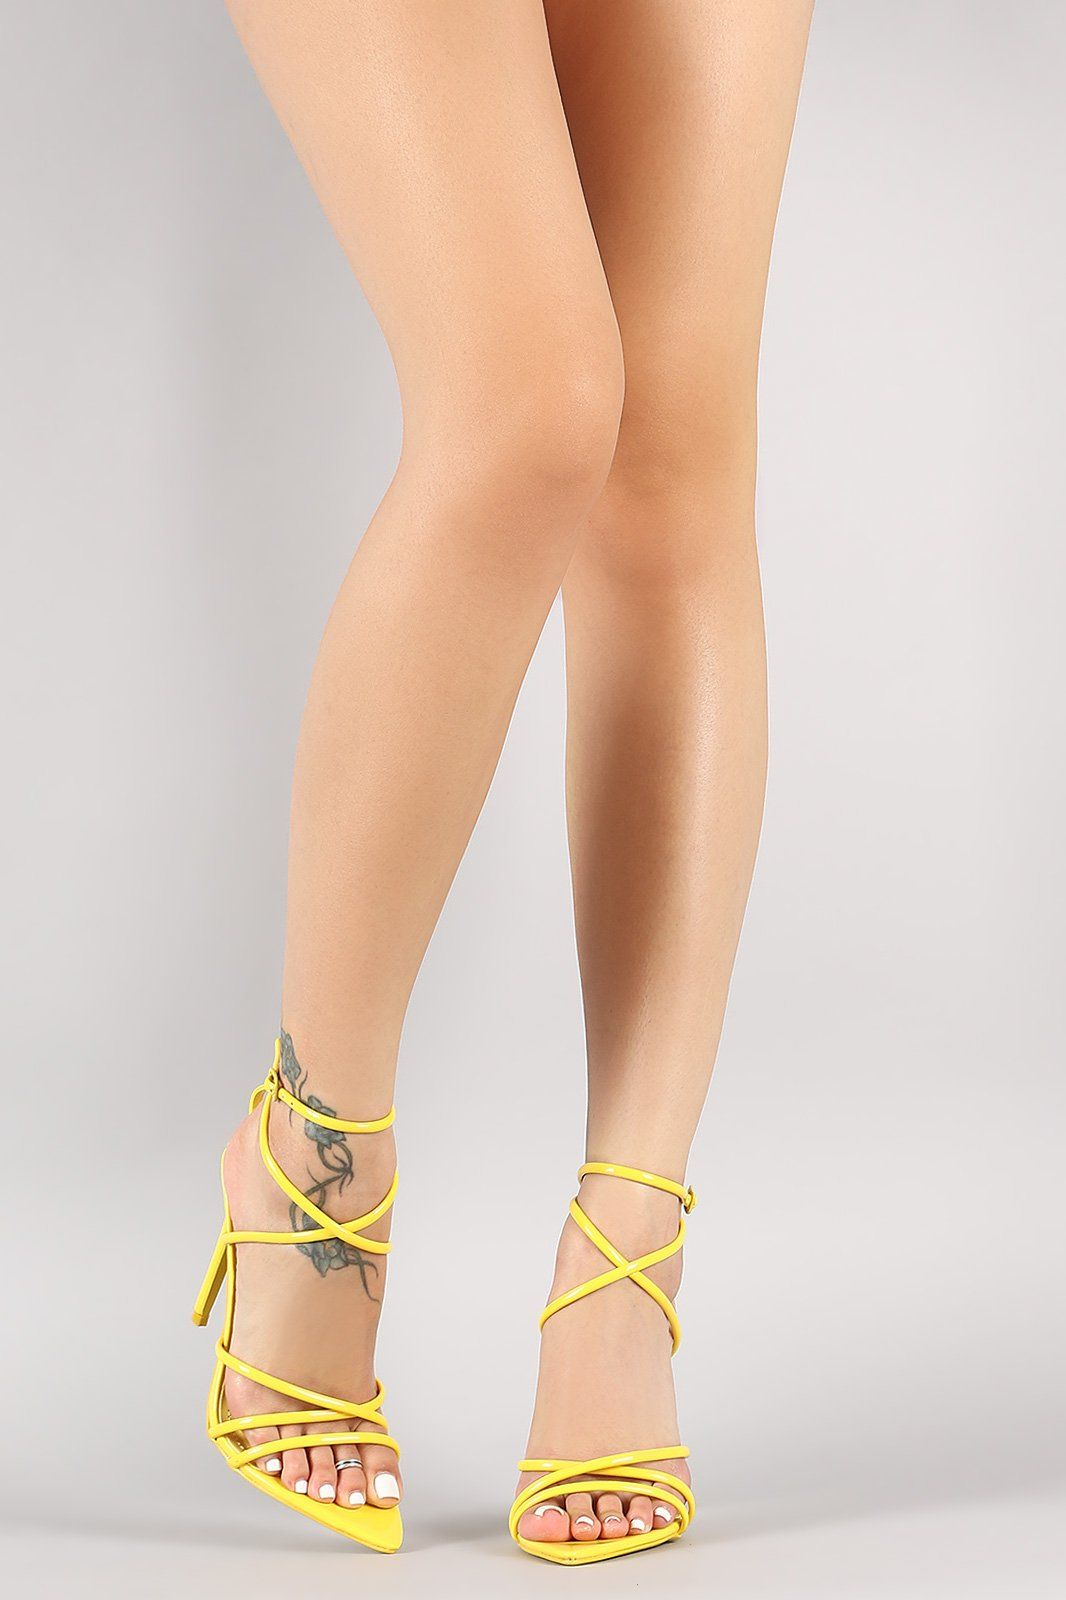 eb8cebbaa2b Strappy Patent Pointed Open Toe Stiletto Heel